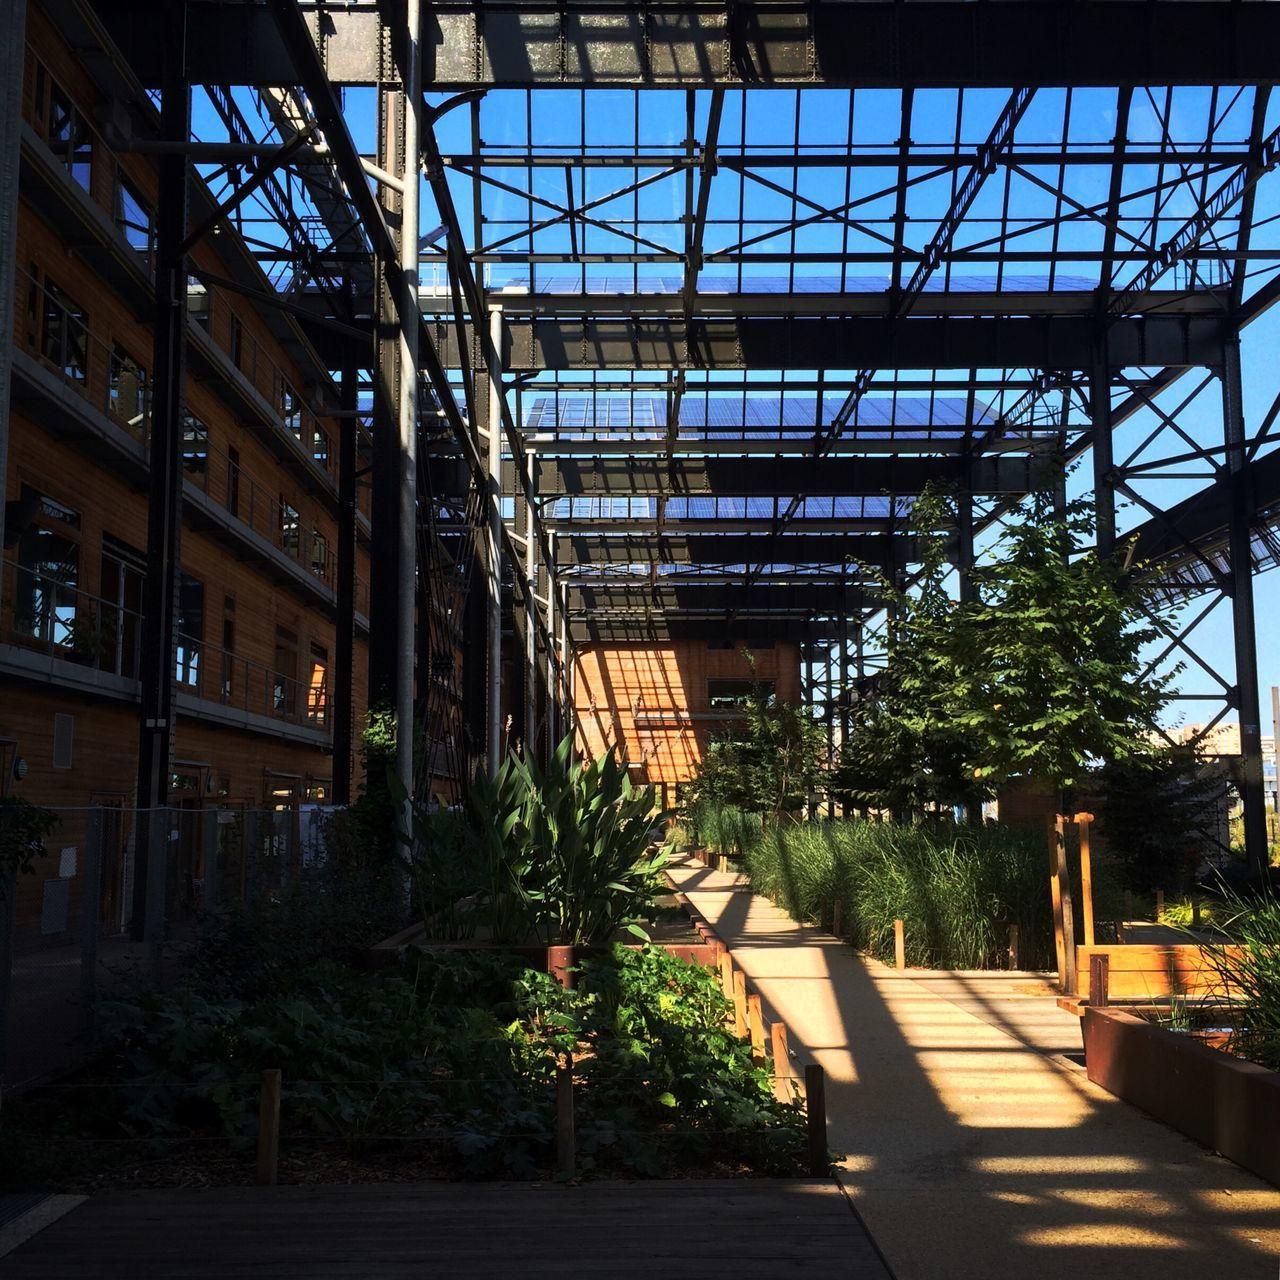 Rue Pajol Pajol Paris Renovation Inside Out Lachapelle Urban Spring Fever